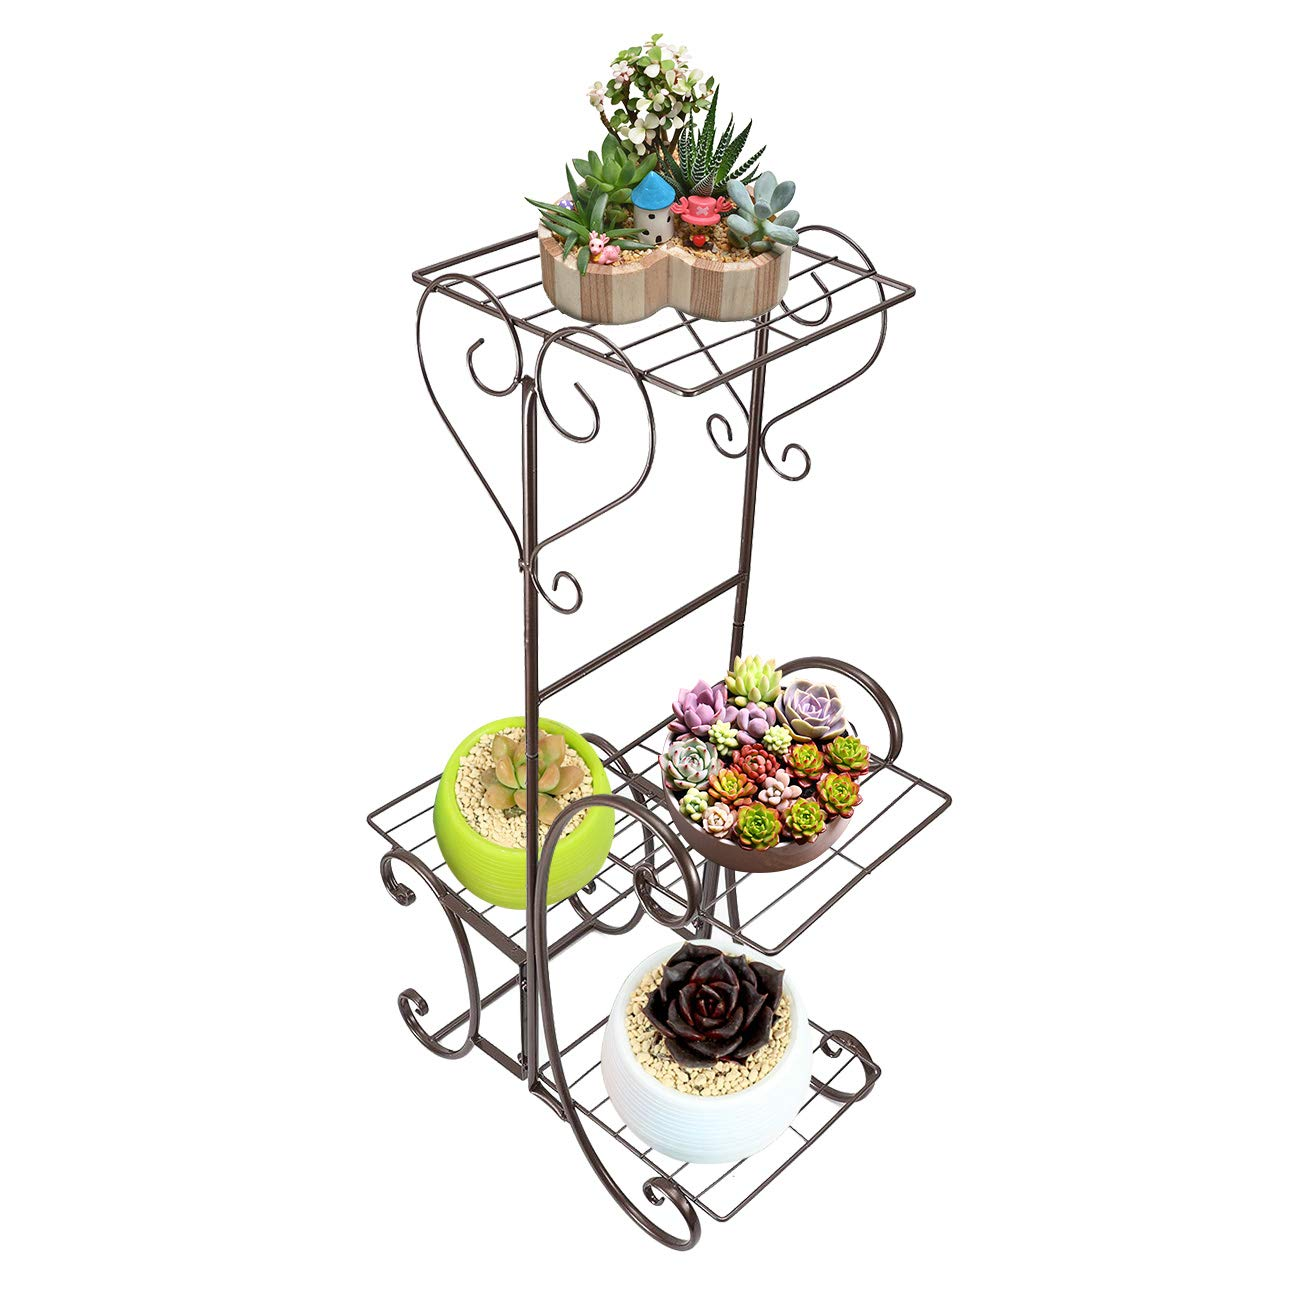 Flower Pot Stand Holder Rack Metal Pot Plant Storage Display Shelf for Garden Home Outdoor Indoor Bronze Dyna-Living Metal Plant Stand 4 Tier